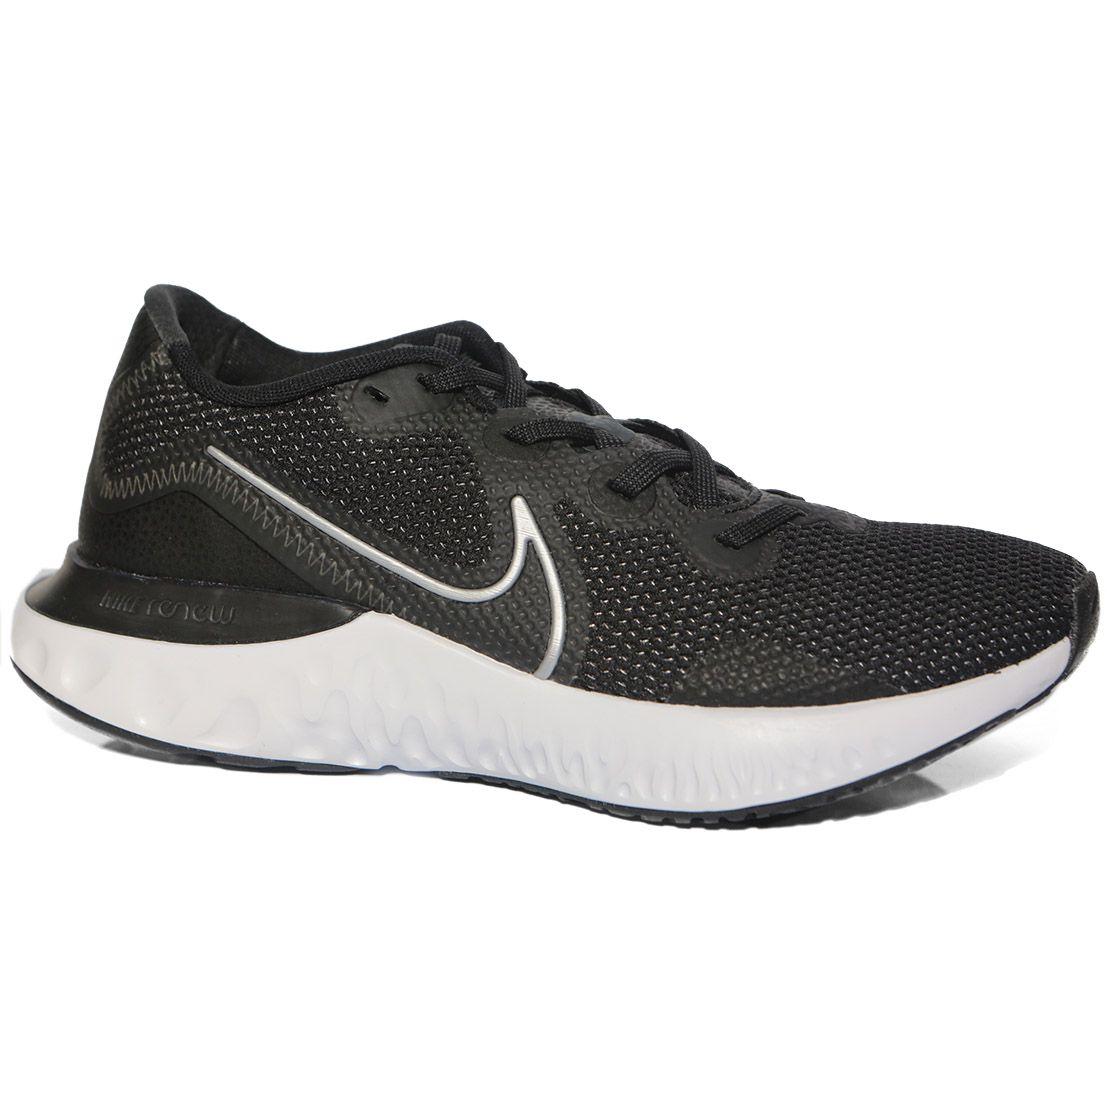 Tênis Nike Renew Run Masculino CK6357